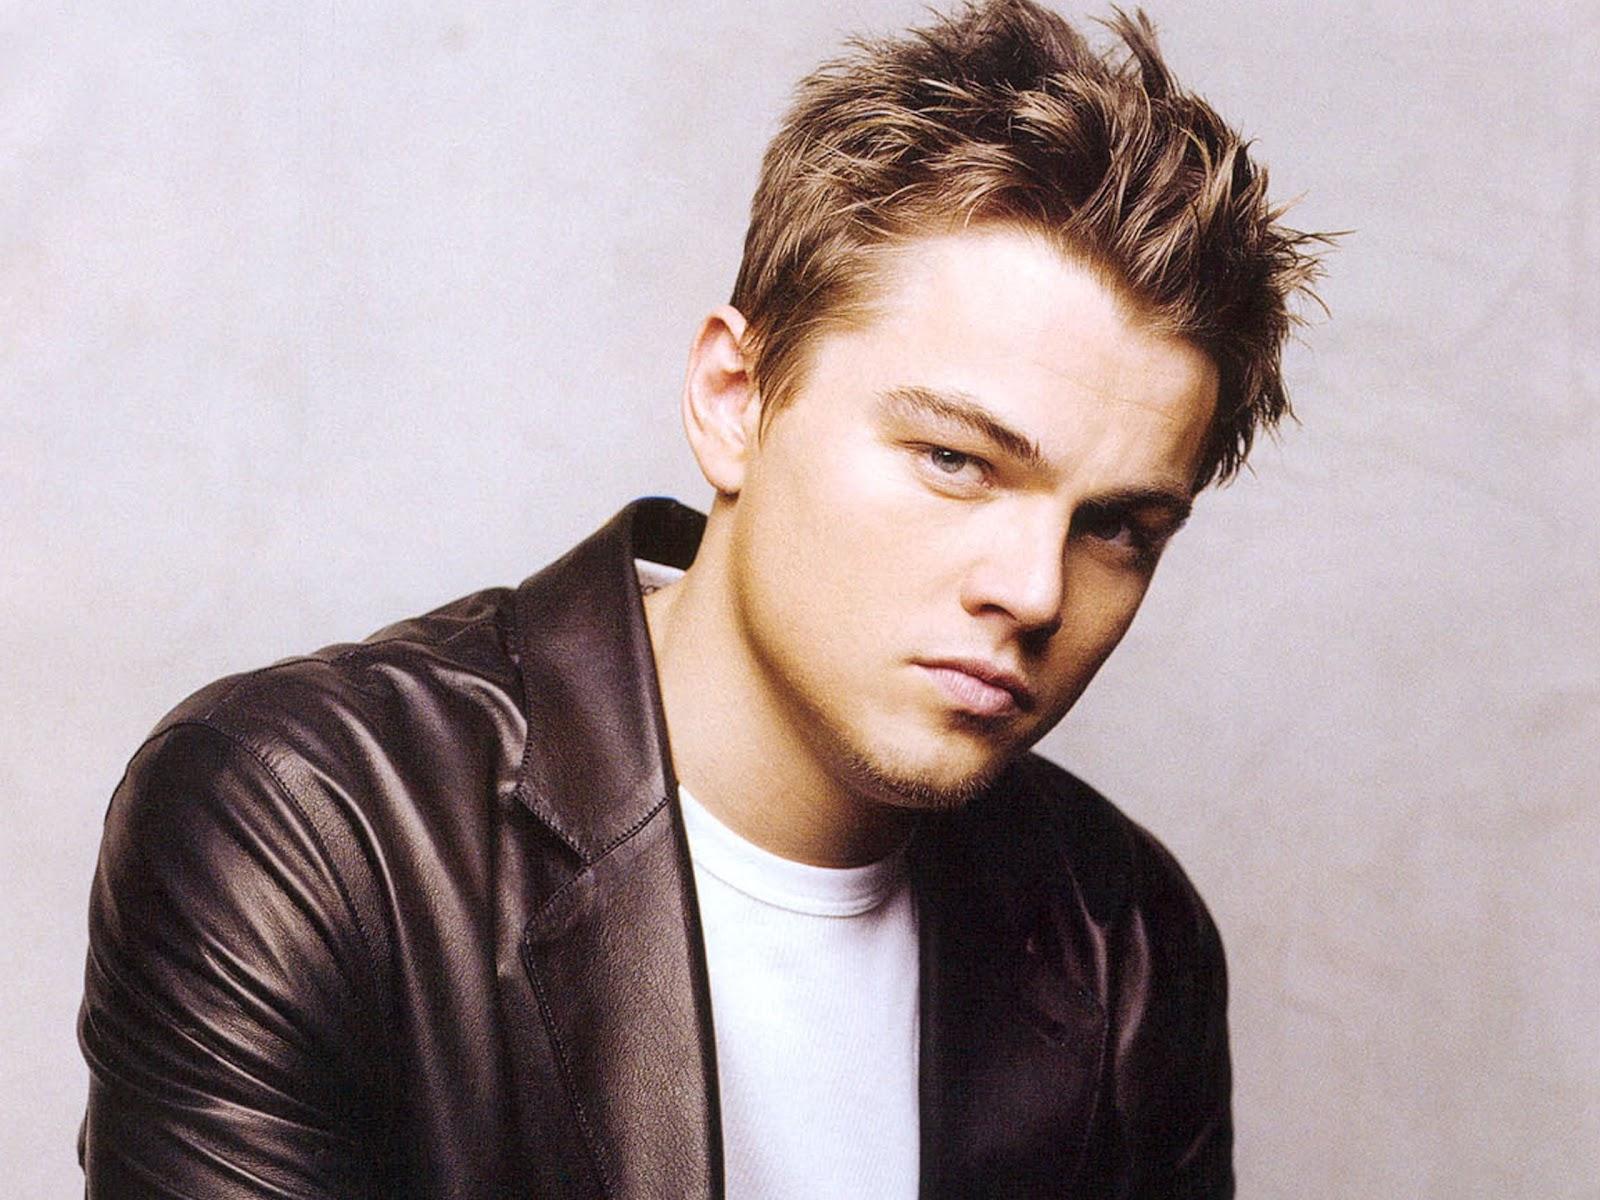 http://4.bp.blogspot.com/-f6YGHExCT9k/TzIgSNN33EI/AAAAAAAAByE/__ltaDcQ_PA/s1600/Leonardo_DiCaprio+05.jpg